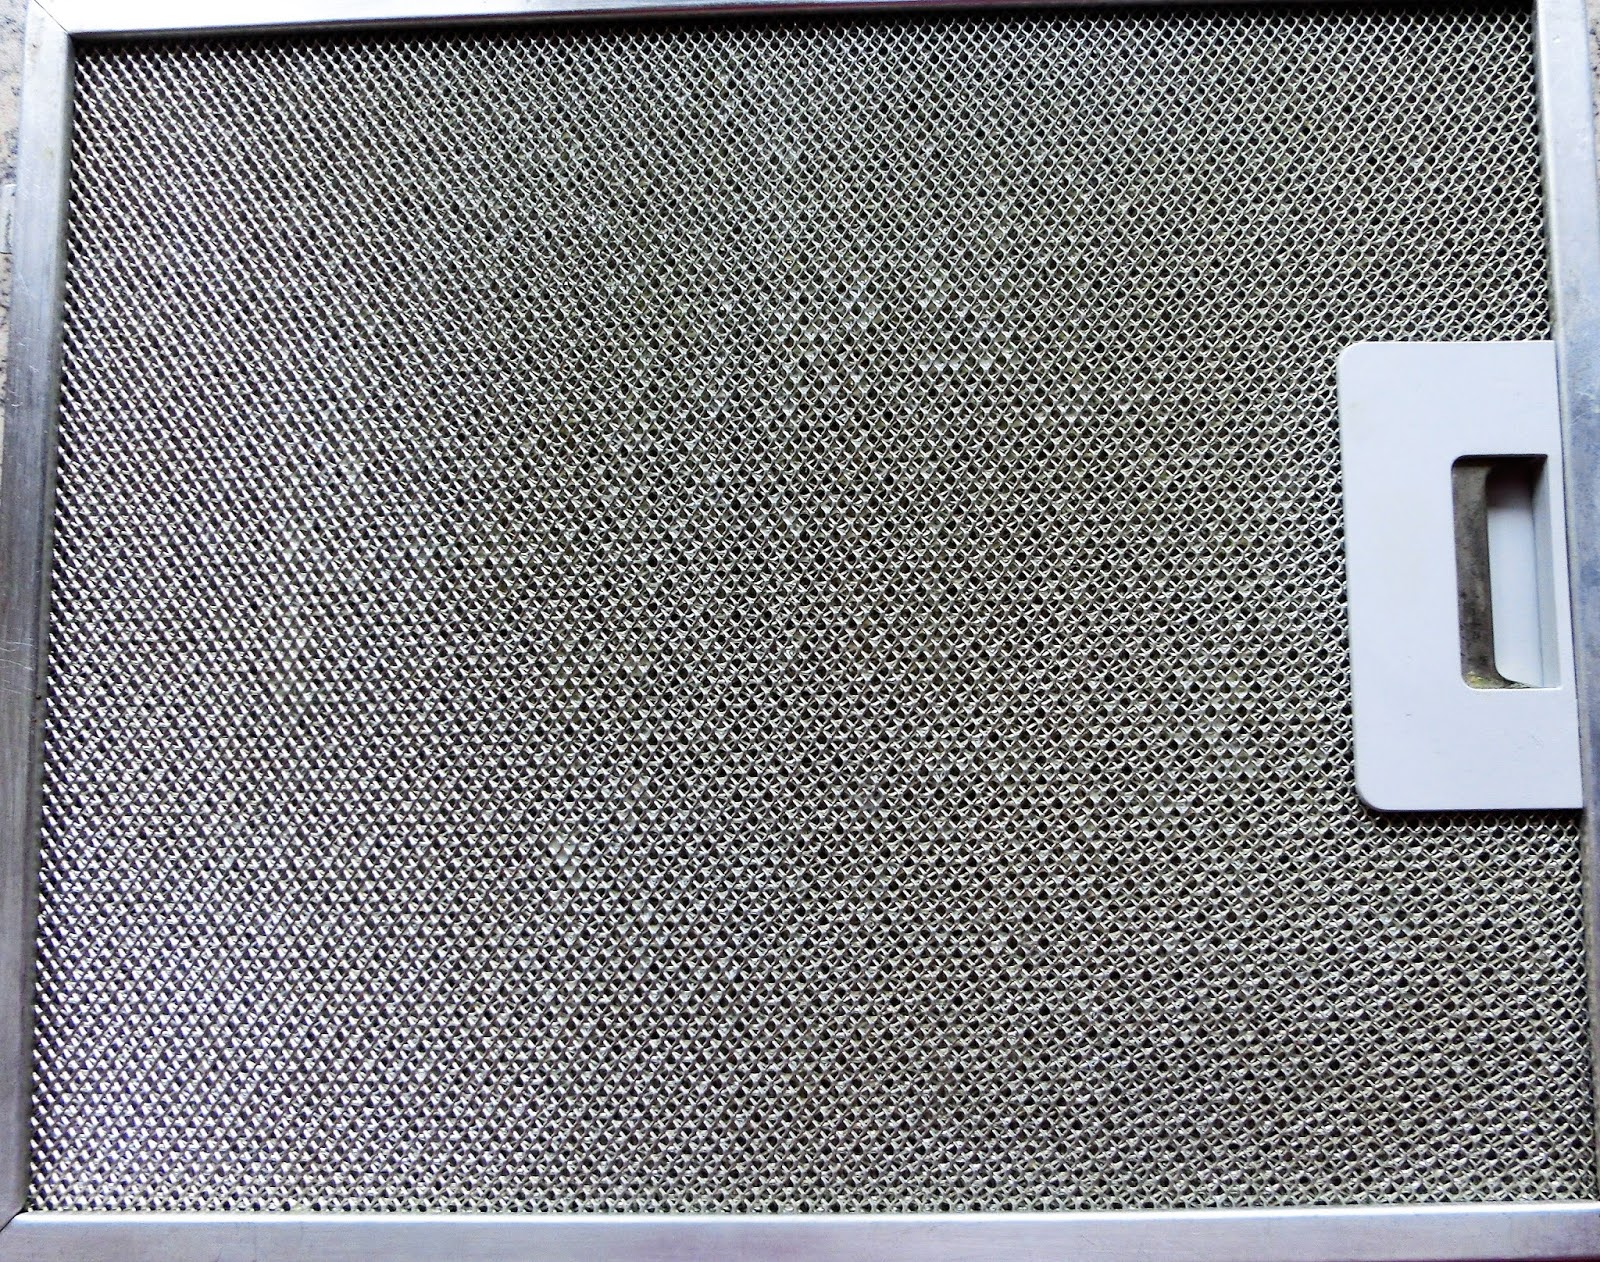 Silverline dunstabzugshauben wandhaube aslim deluxea edelstahl